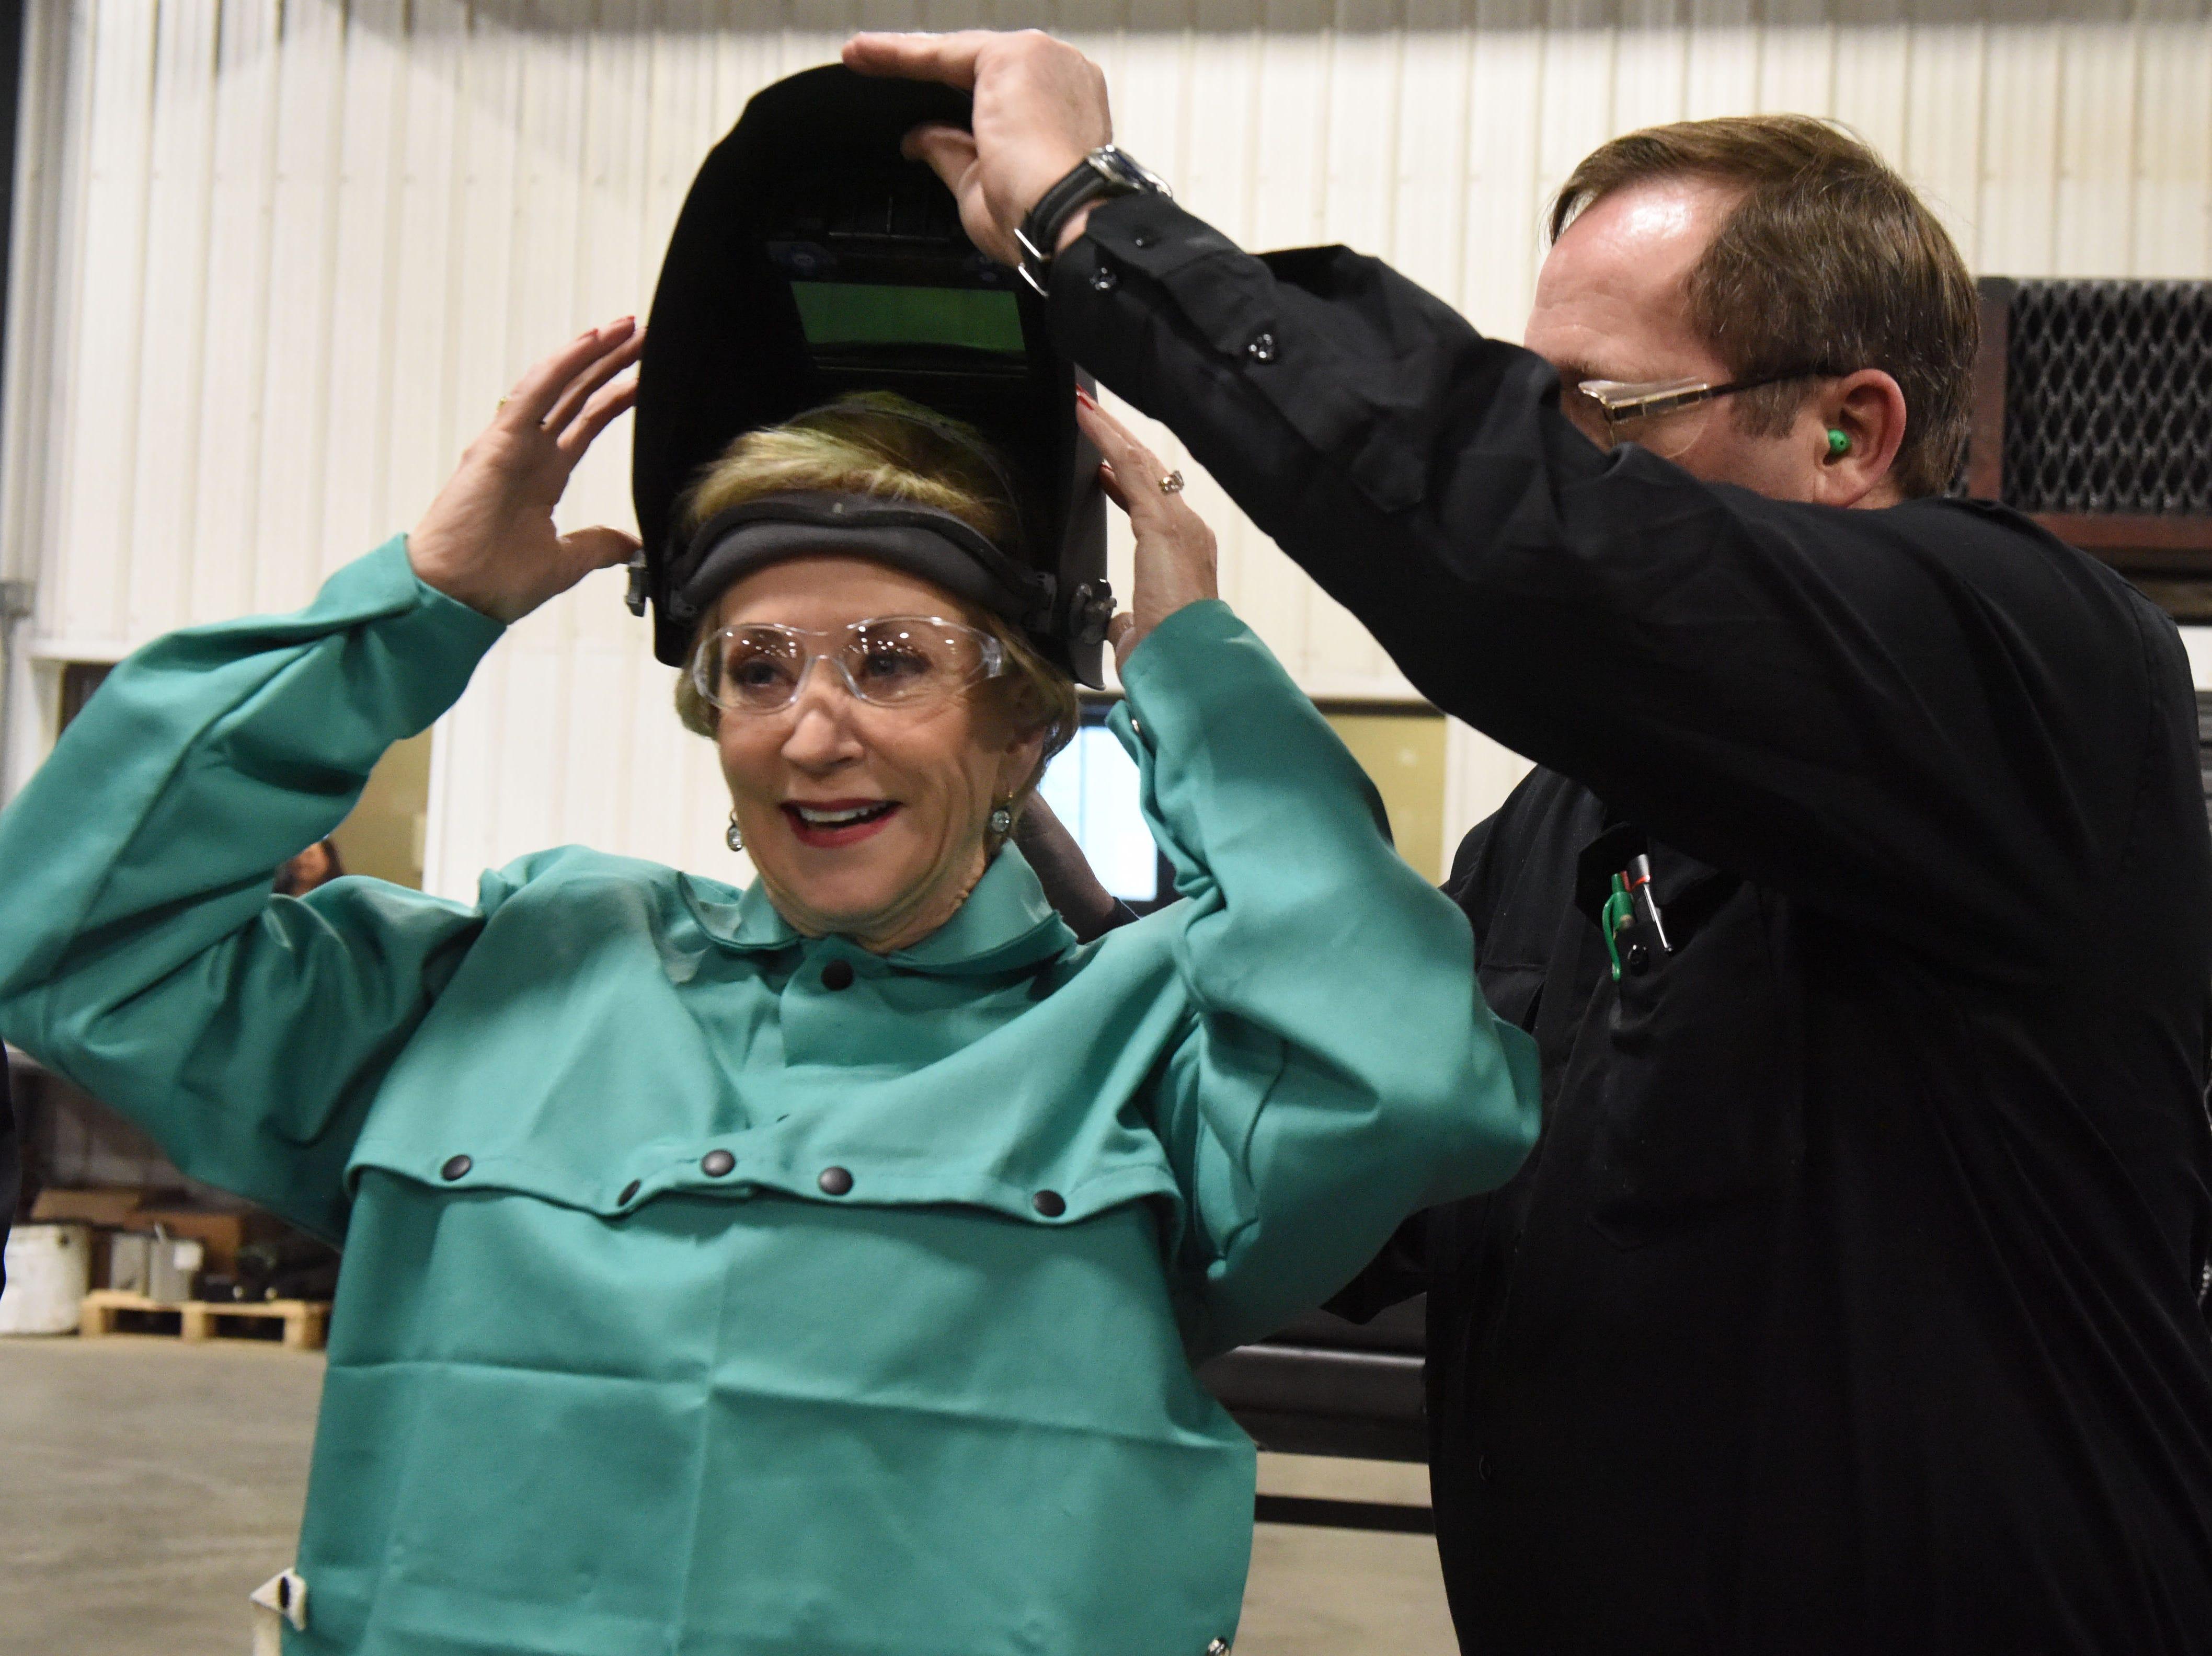 Dennis Roozenboom, welding supervisor, helps Linda McMahon, head of the U.S. Small Business Administration, put on her welding helmet at DeGeest Steel Works in Tea, S.D., Thursday, Nov. 29, 2018.